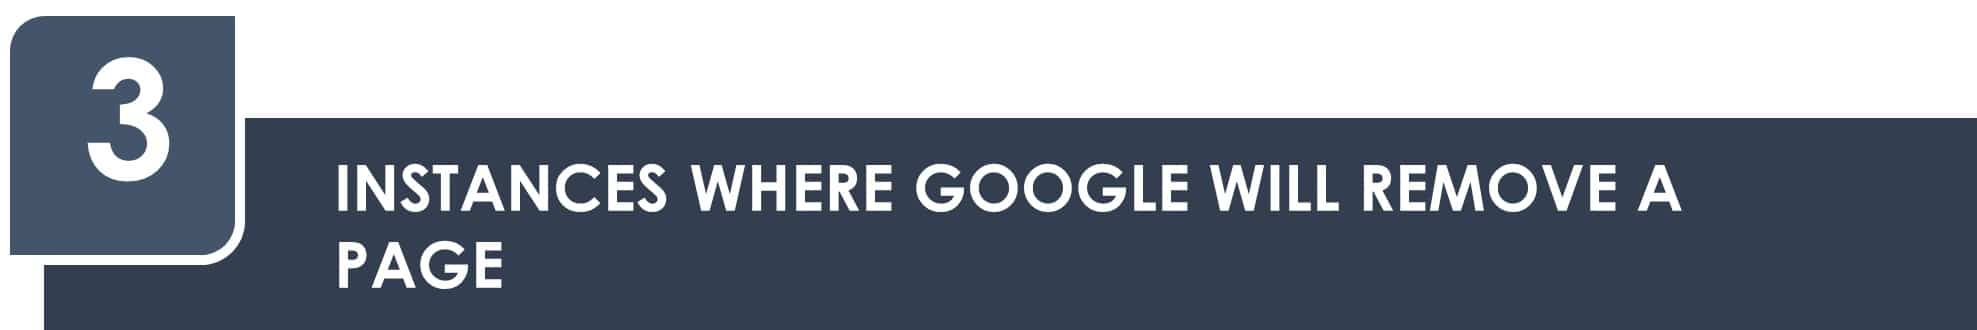 Instances where Google will remove a page